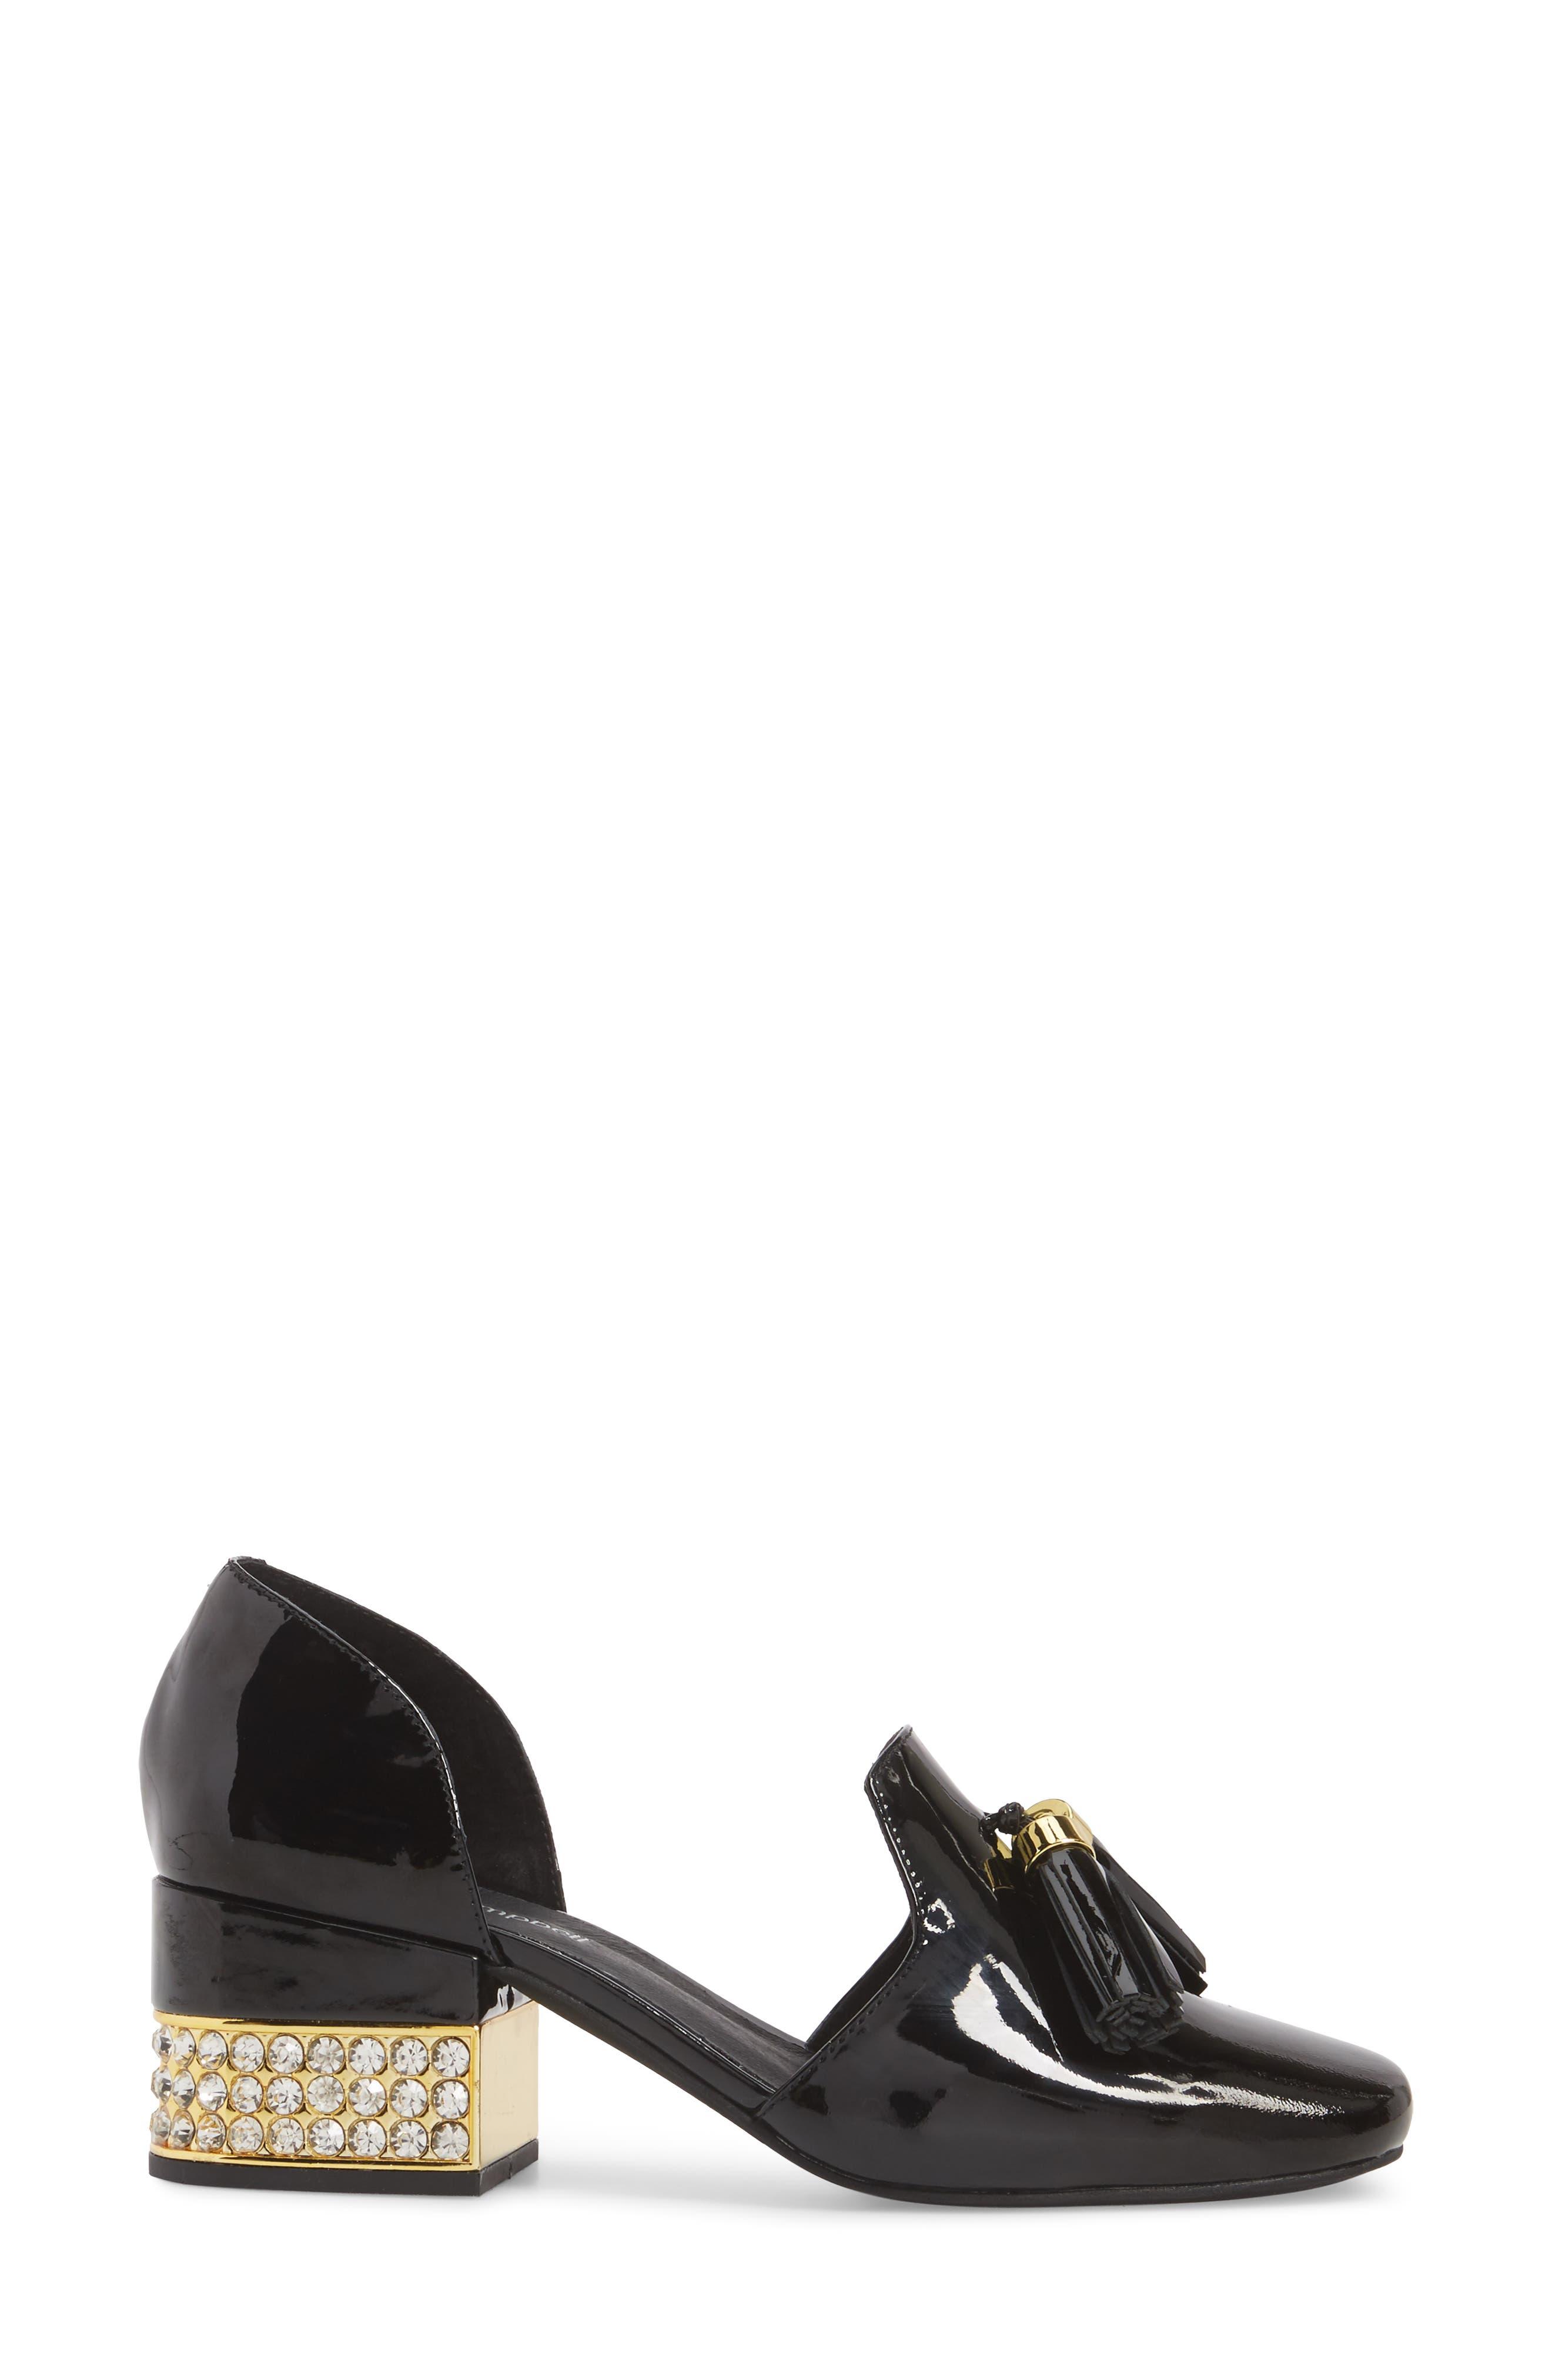 Genial Statement Heel d'Orsay Pump,                             Alternate thumbnail 3, color,                             Black Patent Leather